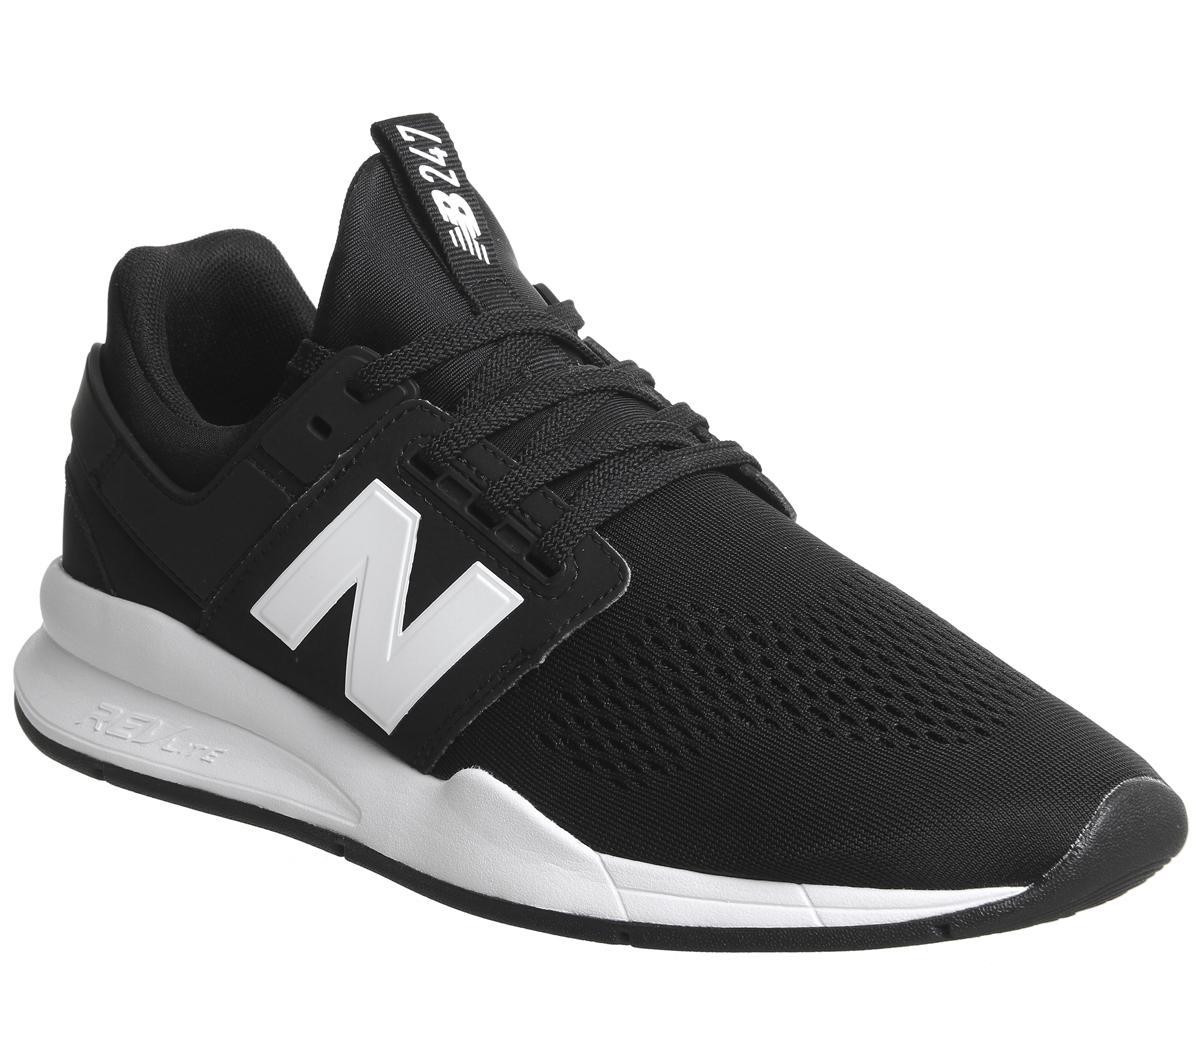 New Balance 247v2 Trainers Black White